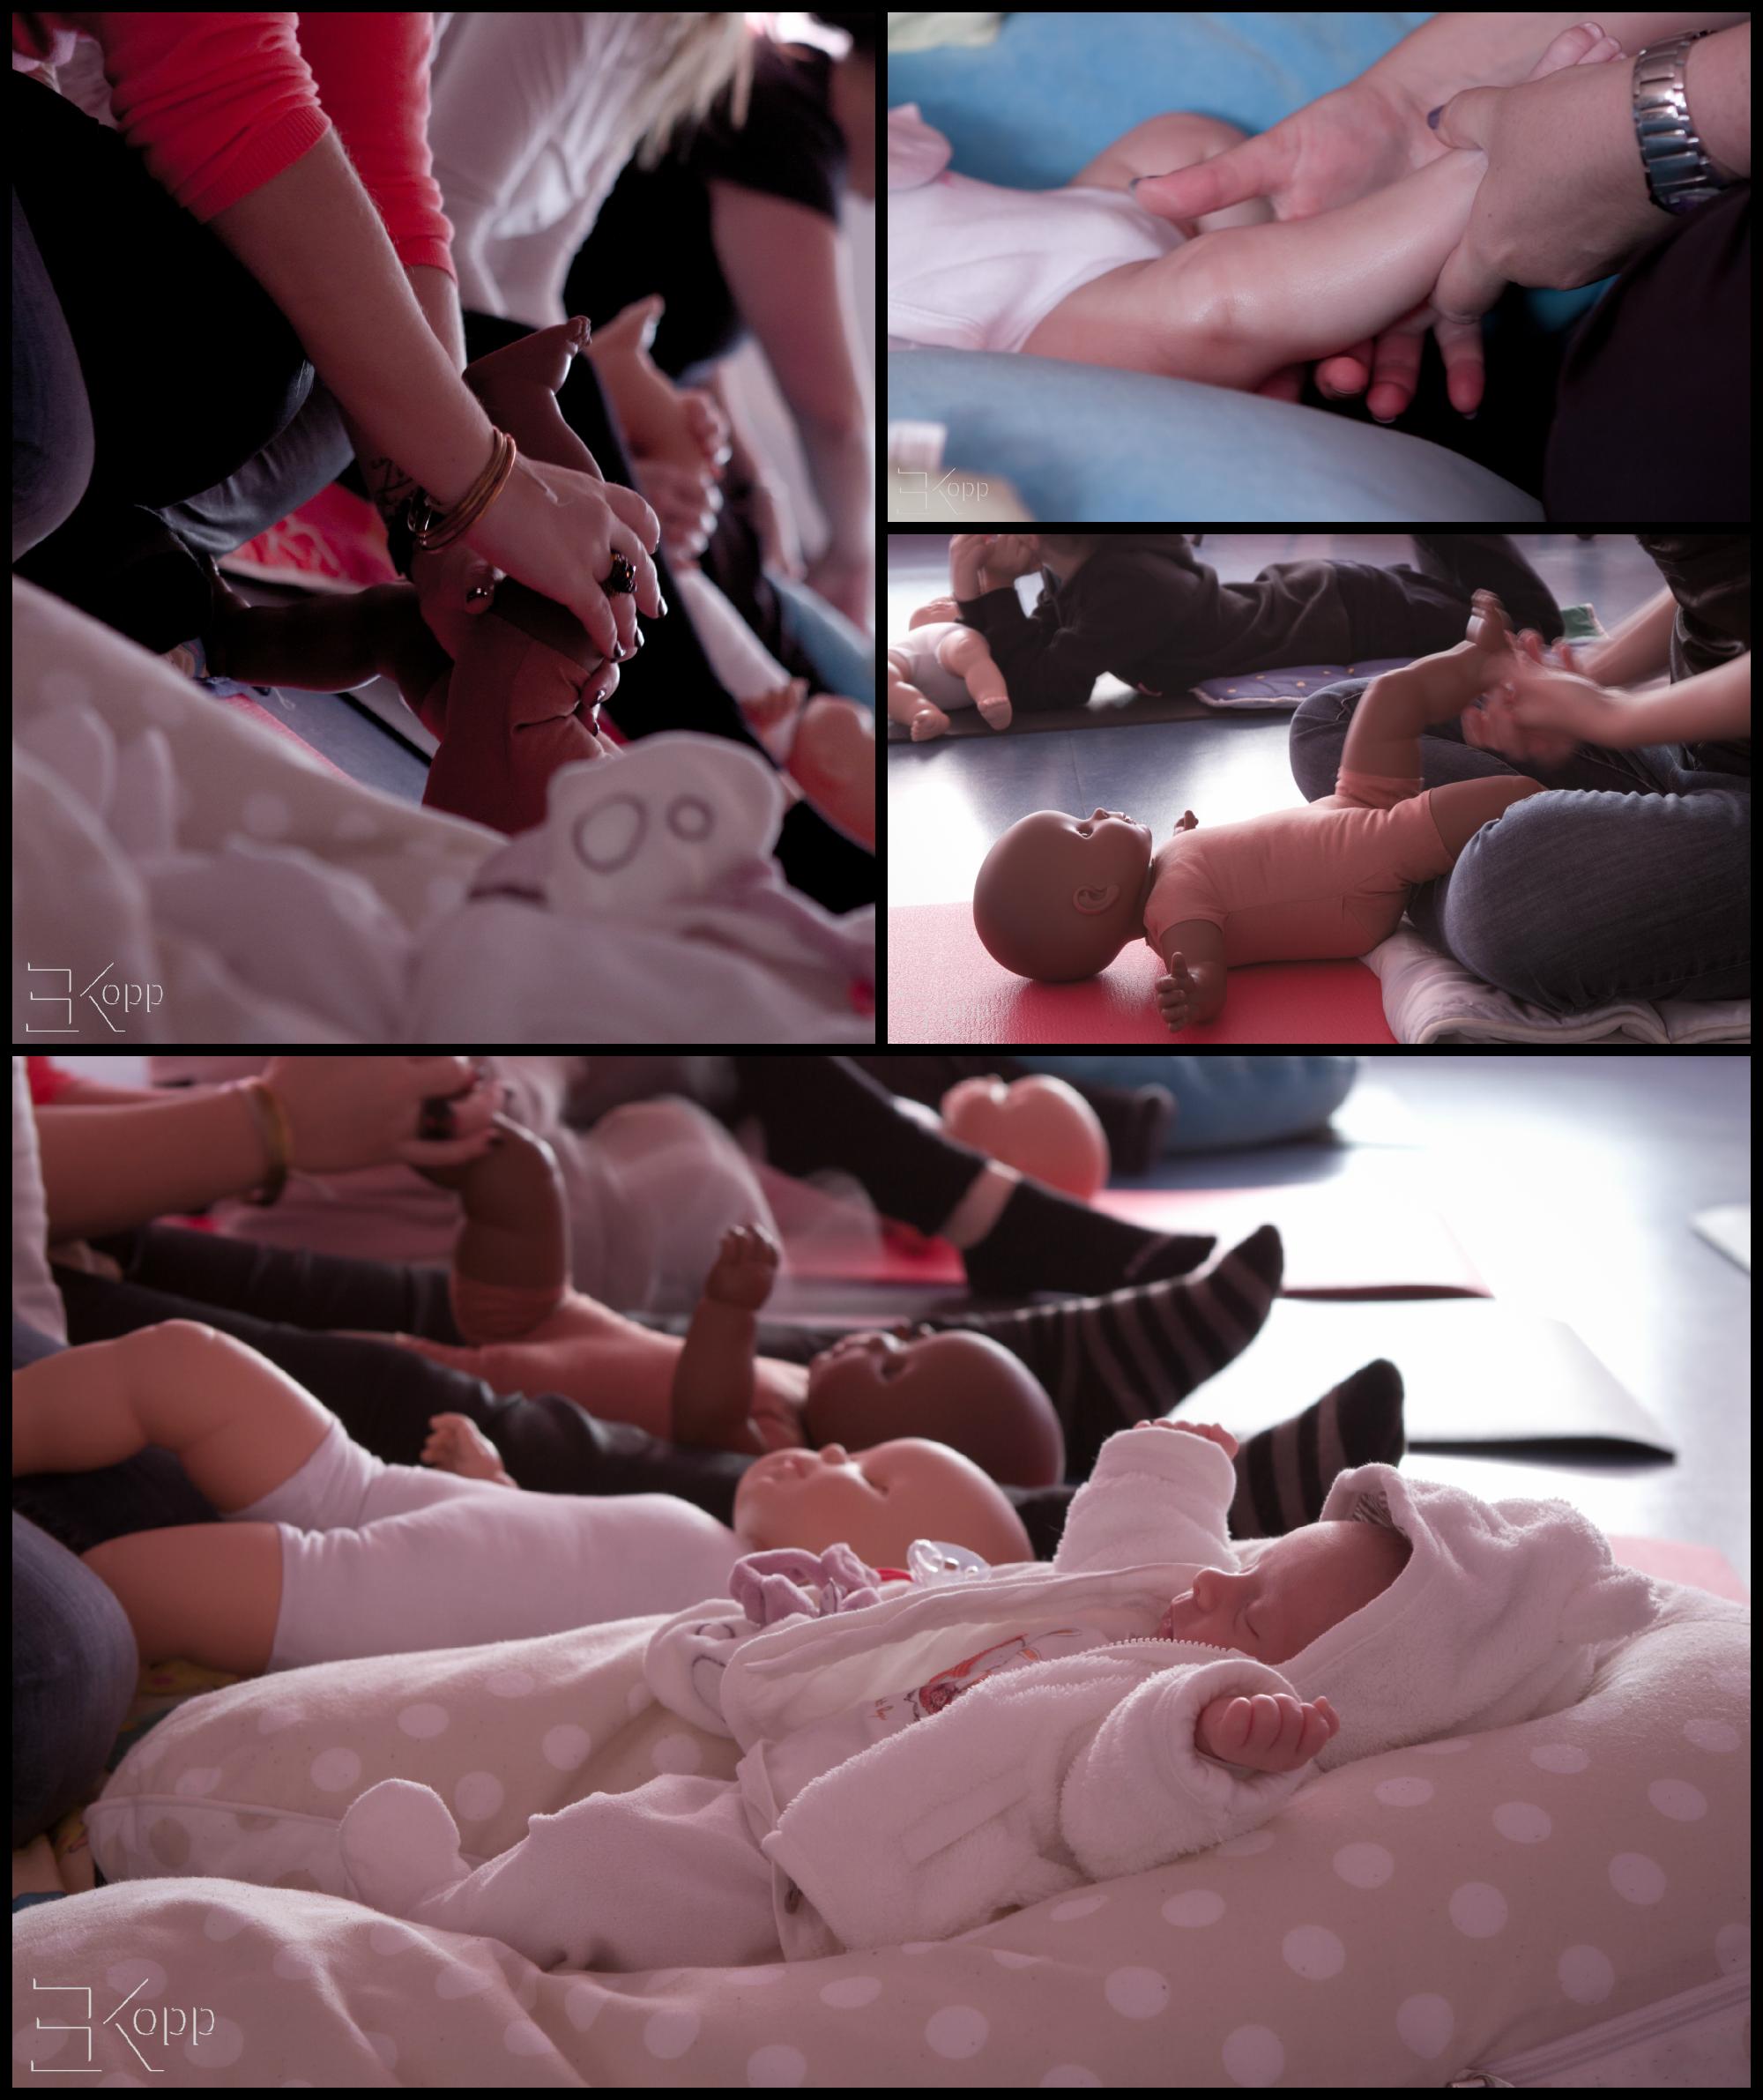 PicMonkey Collage (7)